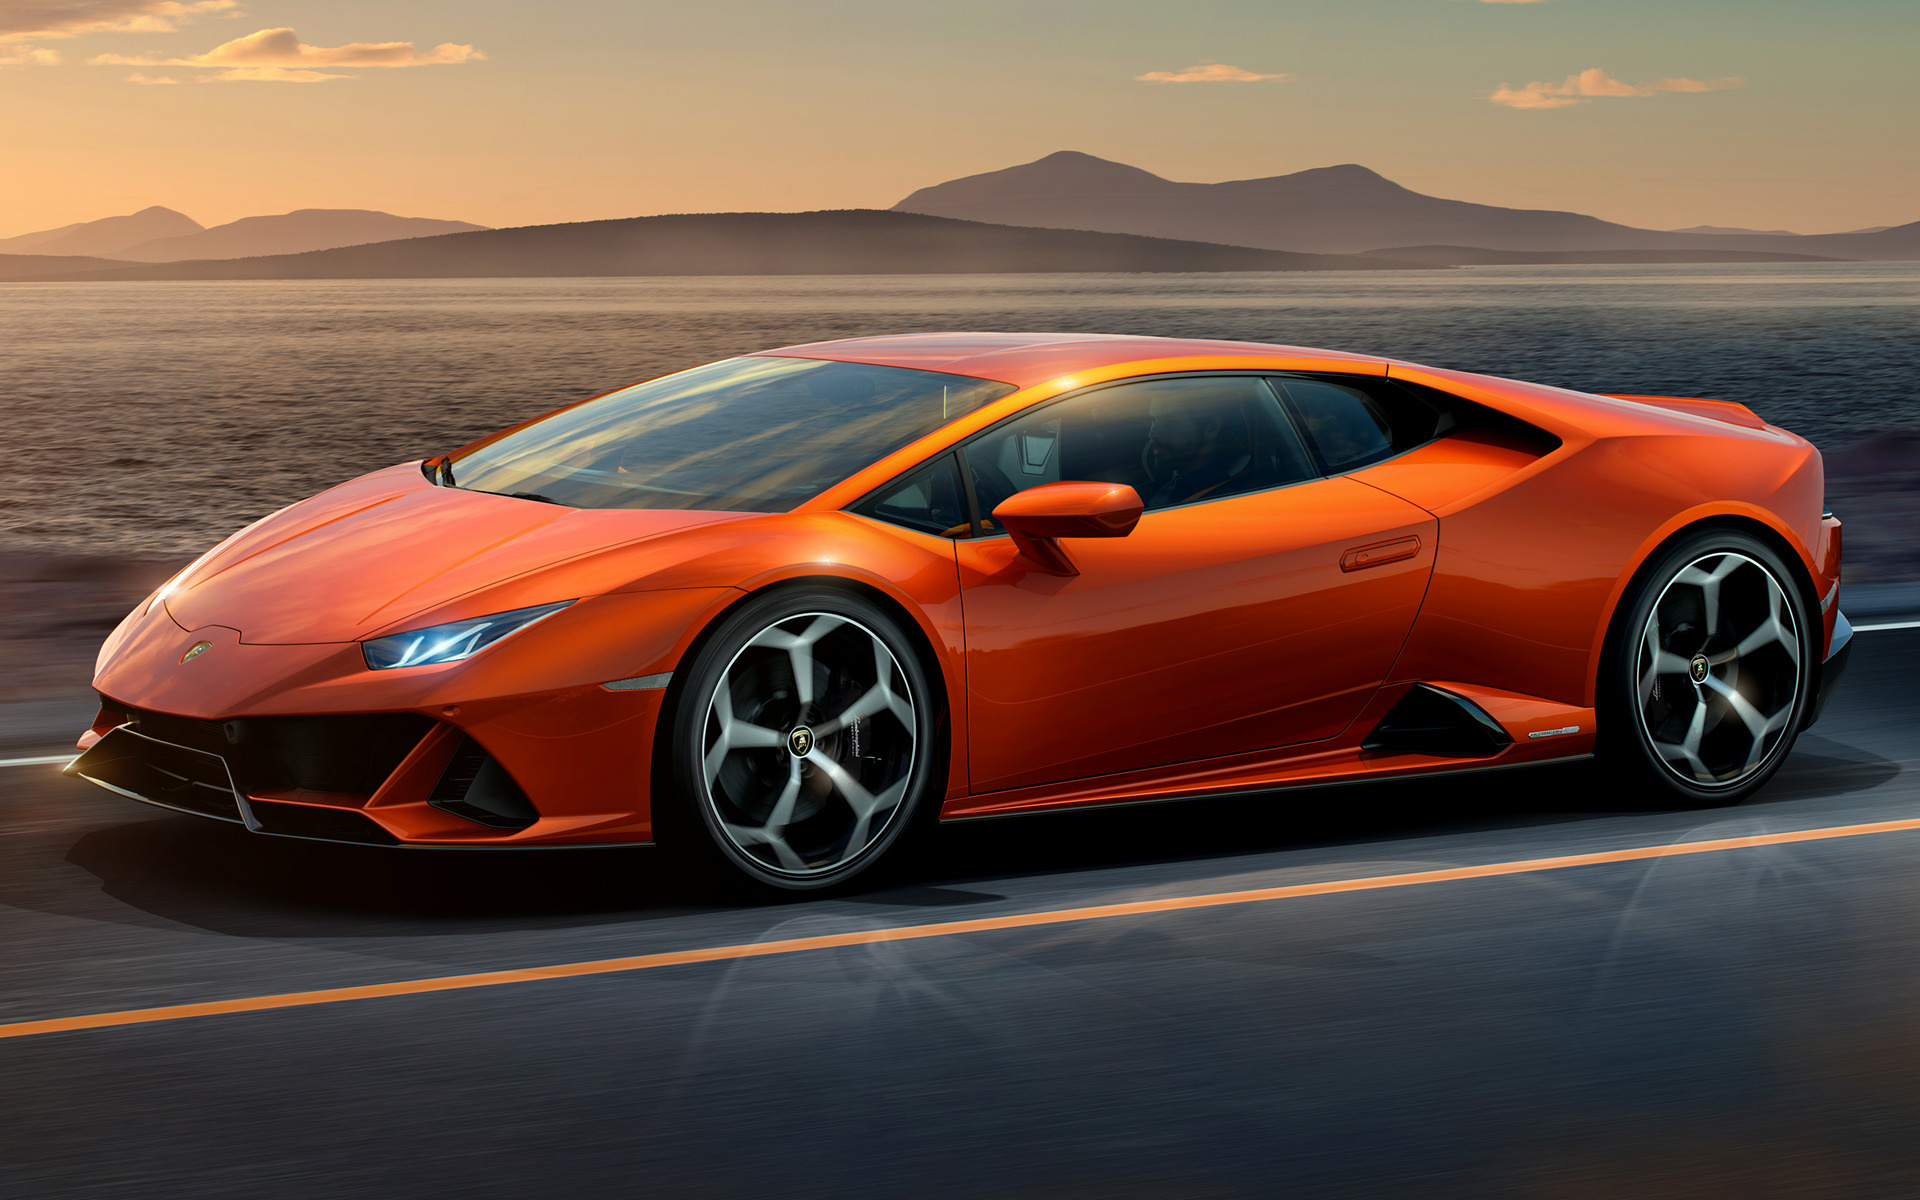 2019 Lamborghini Huracan Evo - Wallpapers and HD Images ...